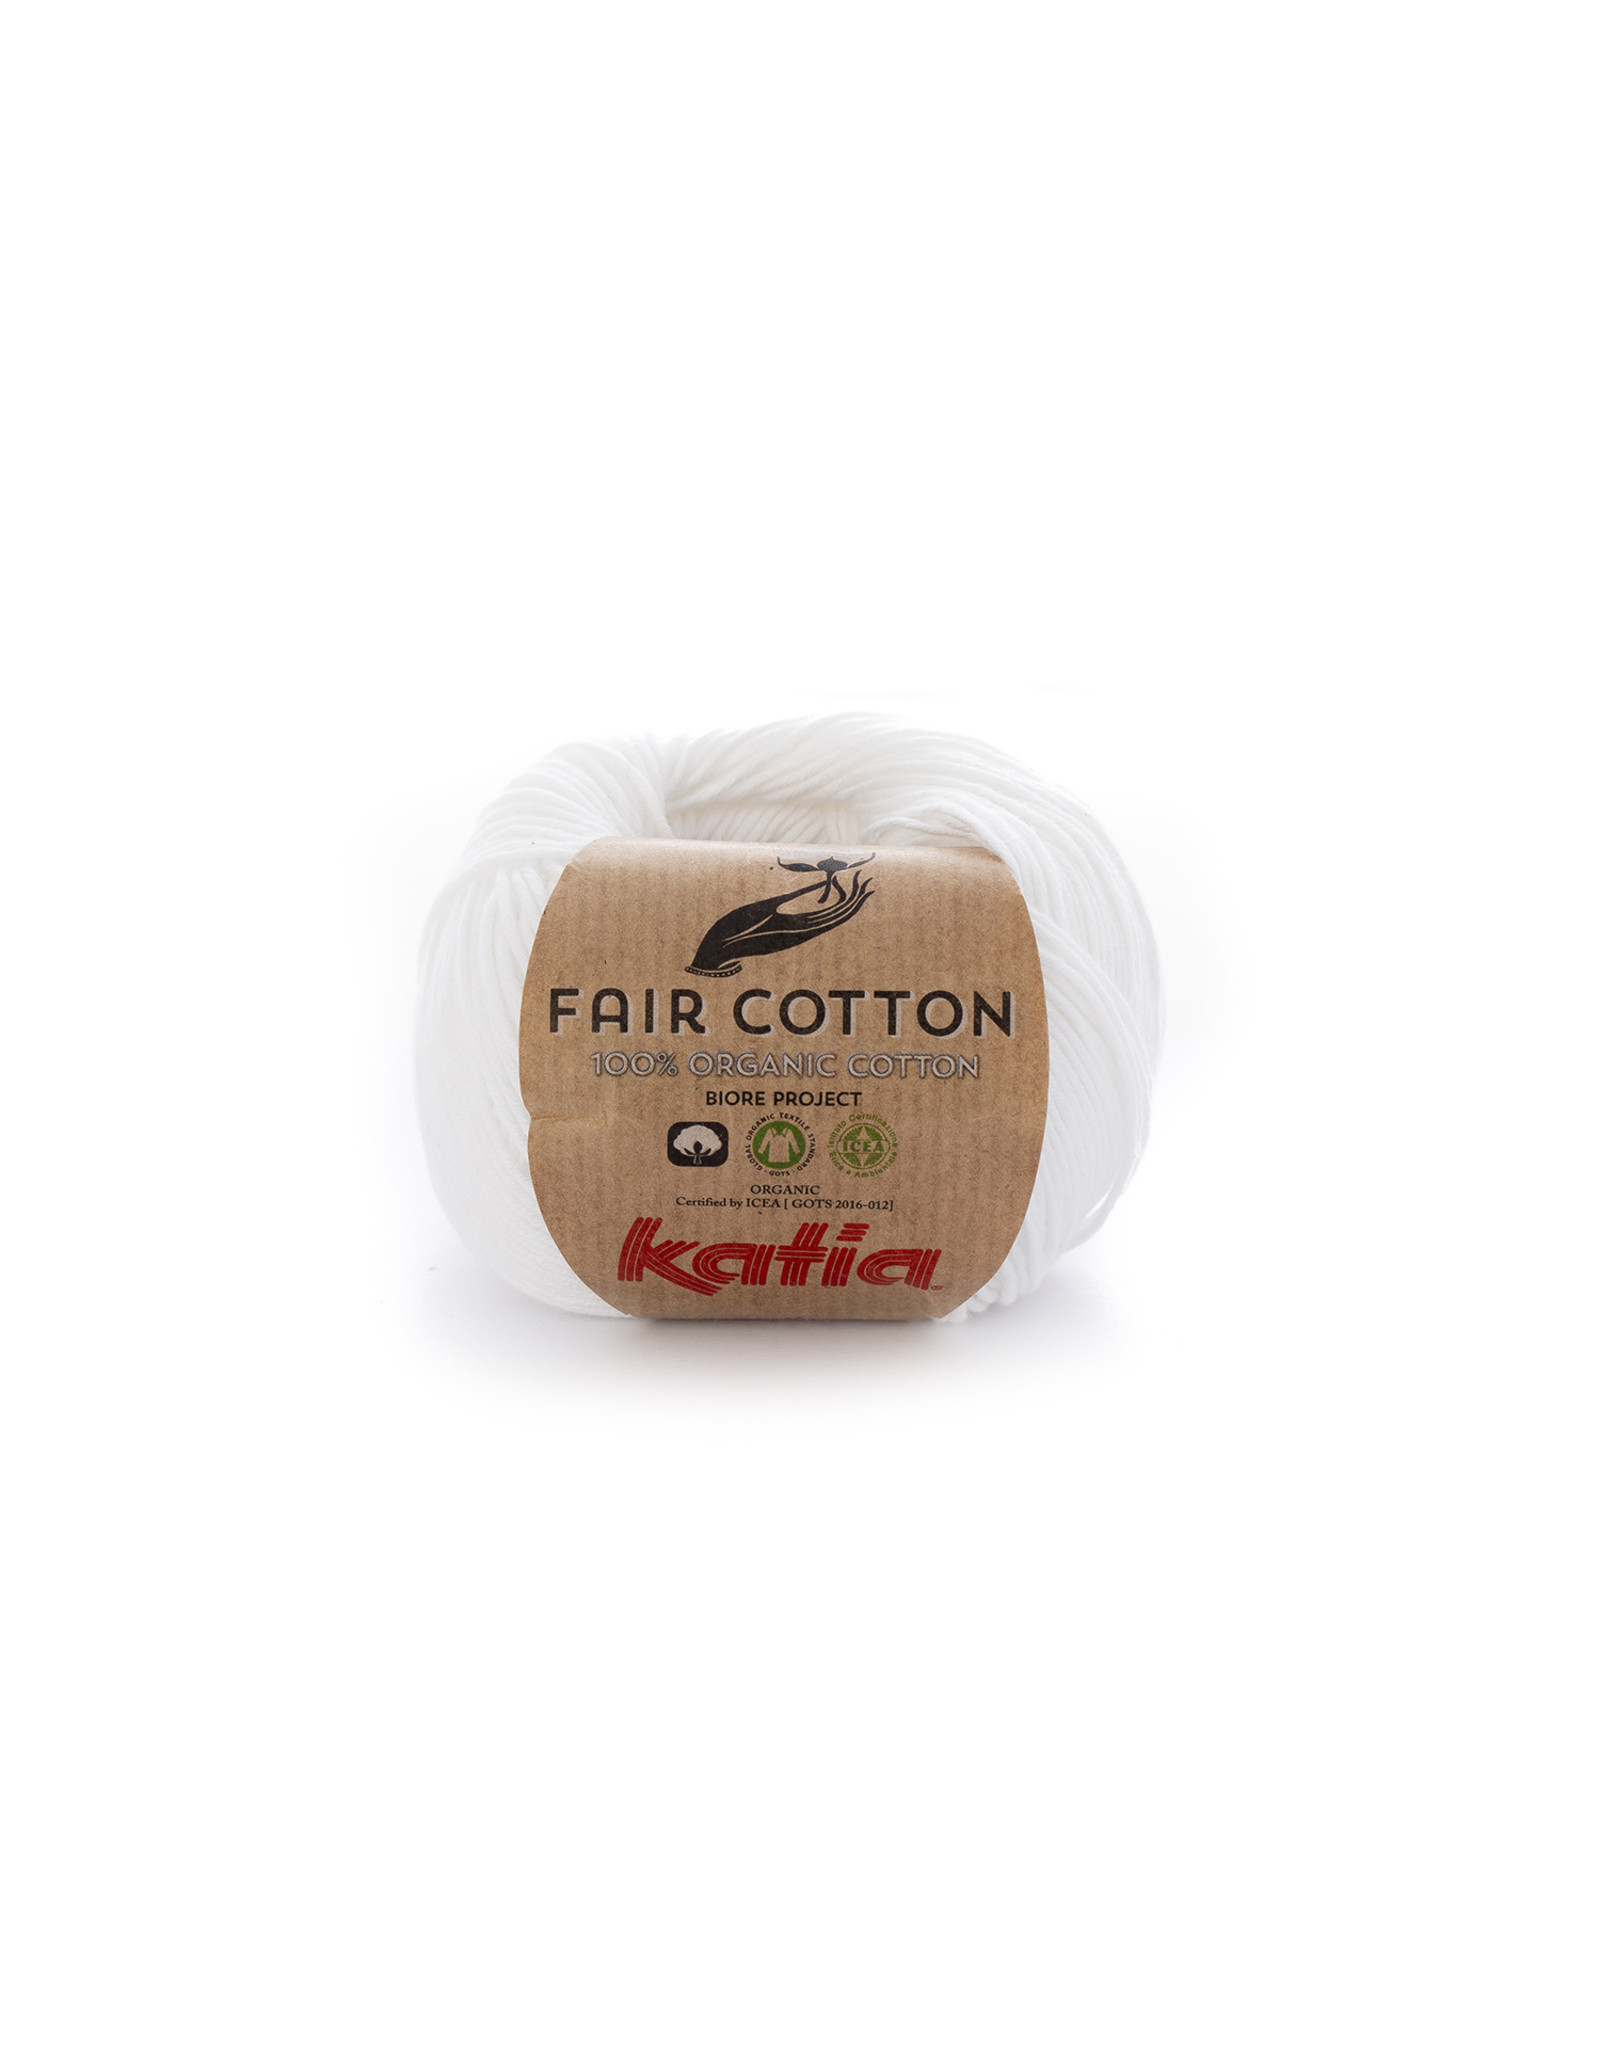 Katia Katia Fair Cotton - kleur 1 - wit- 50 gr. - 100% biol. katoen